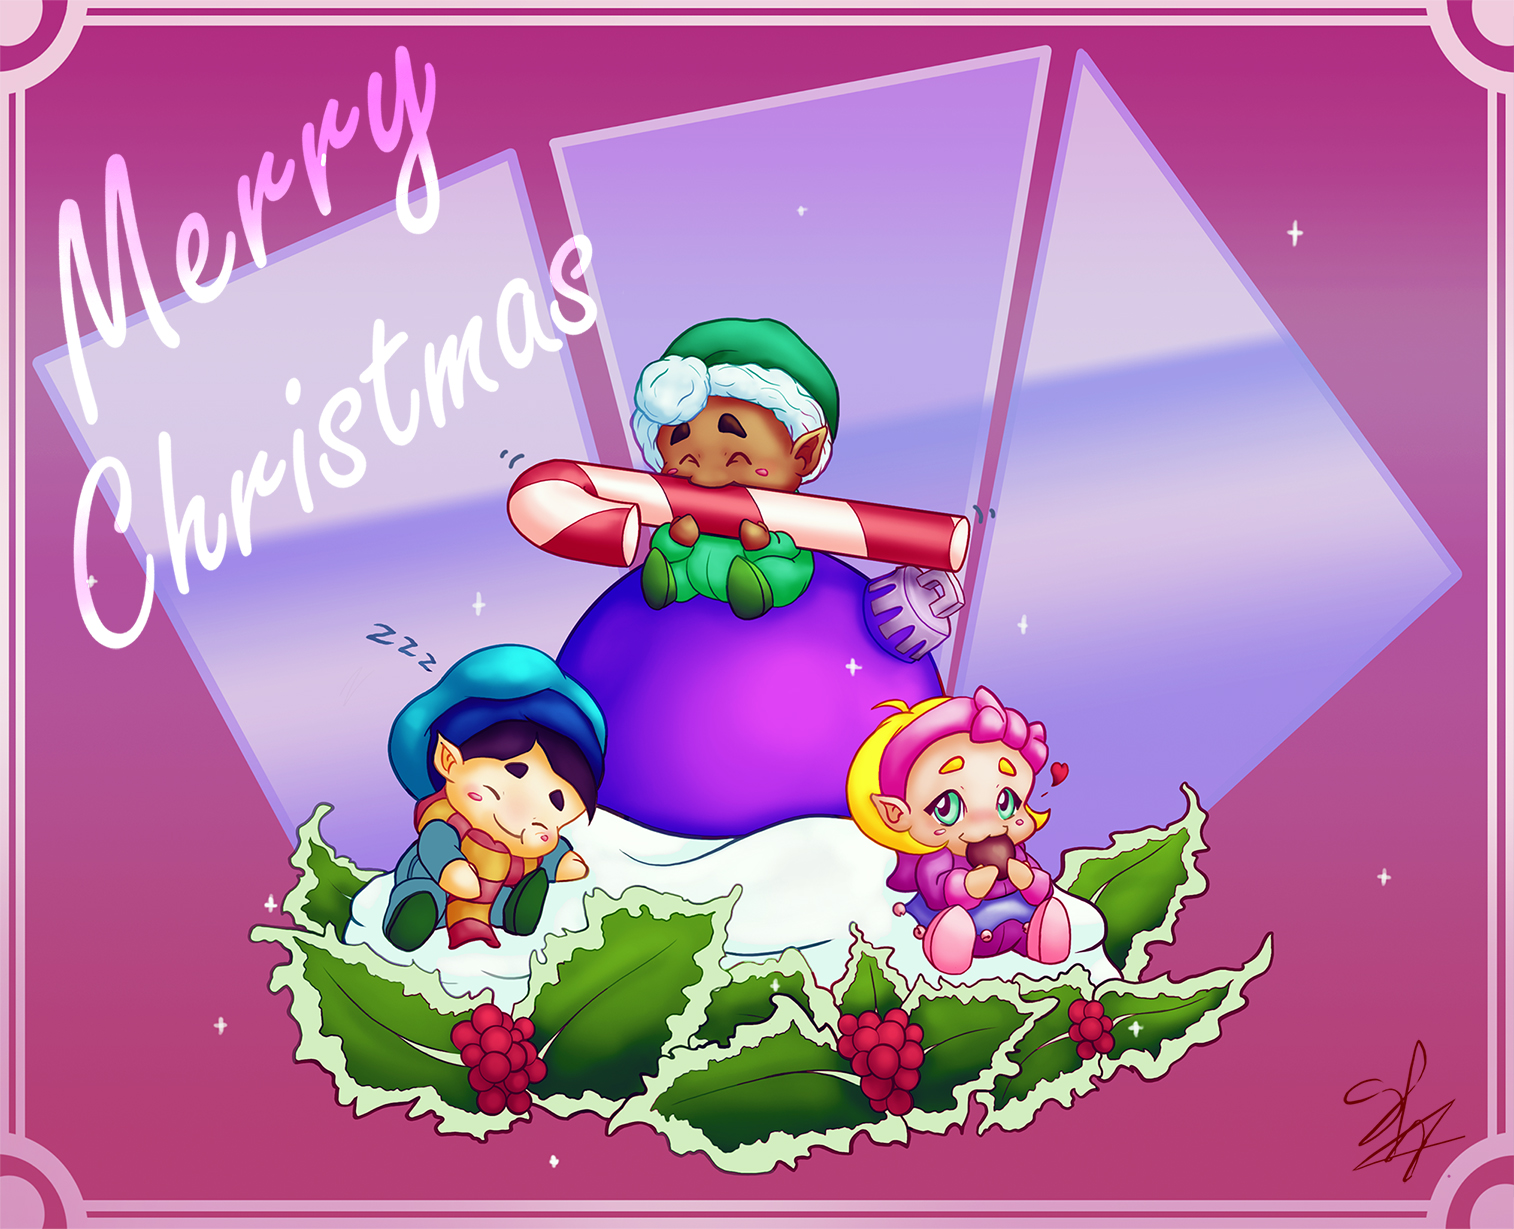 Merry Christmas! Eat, love and sleep